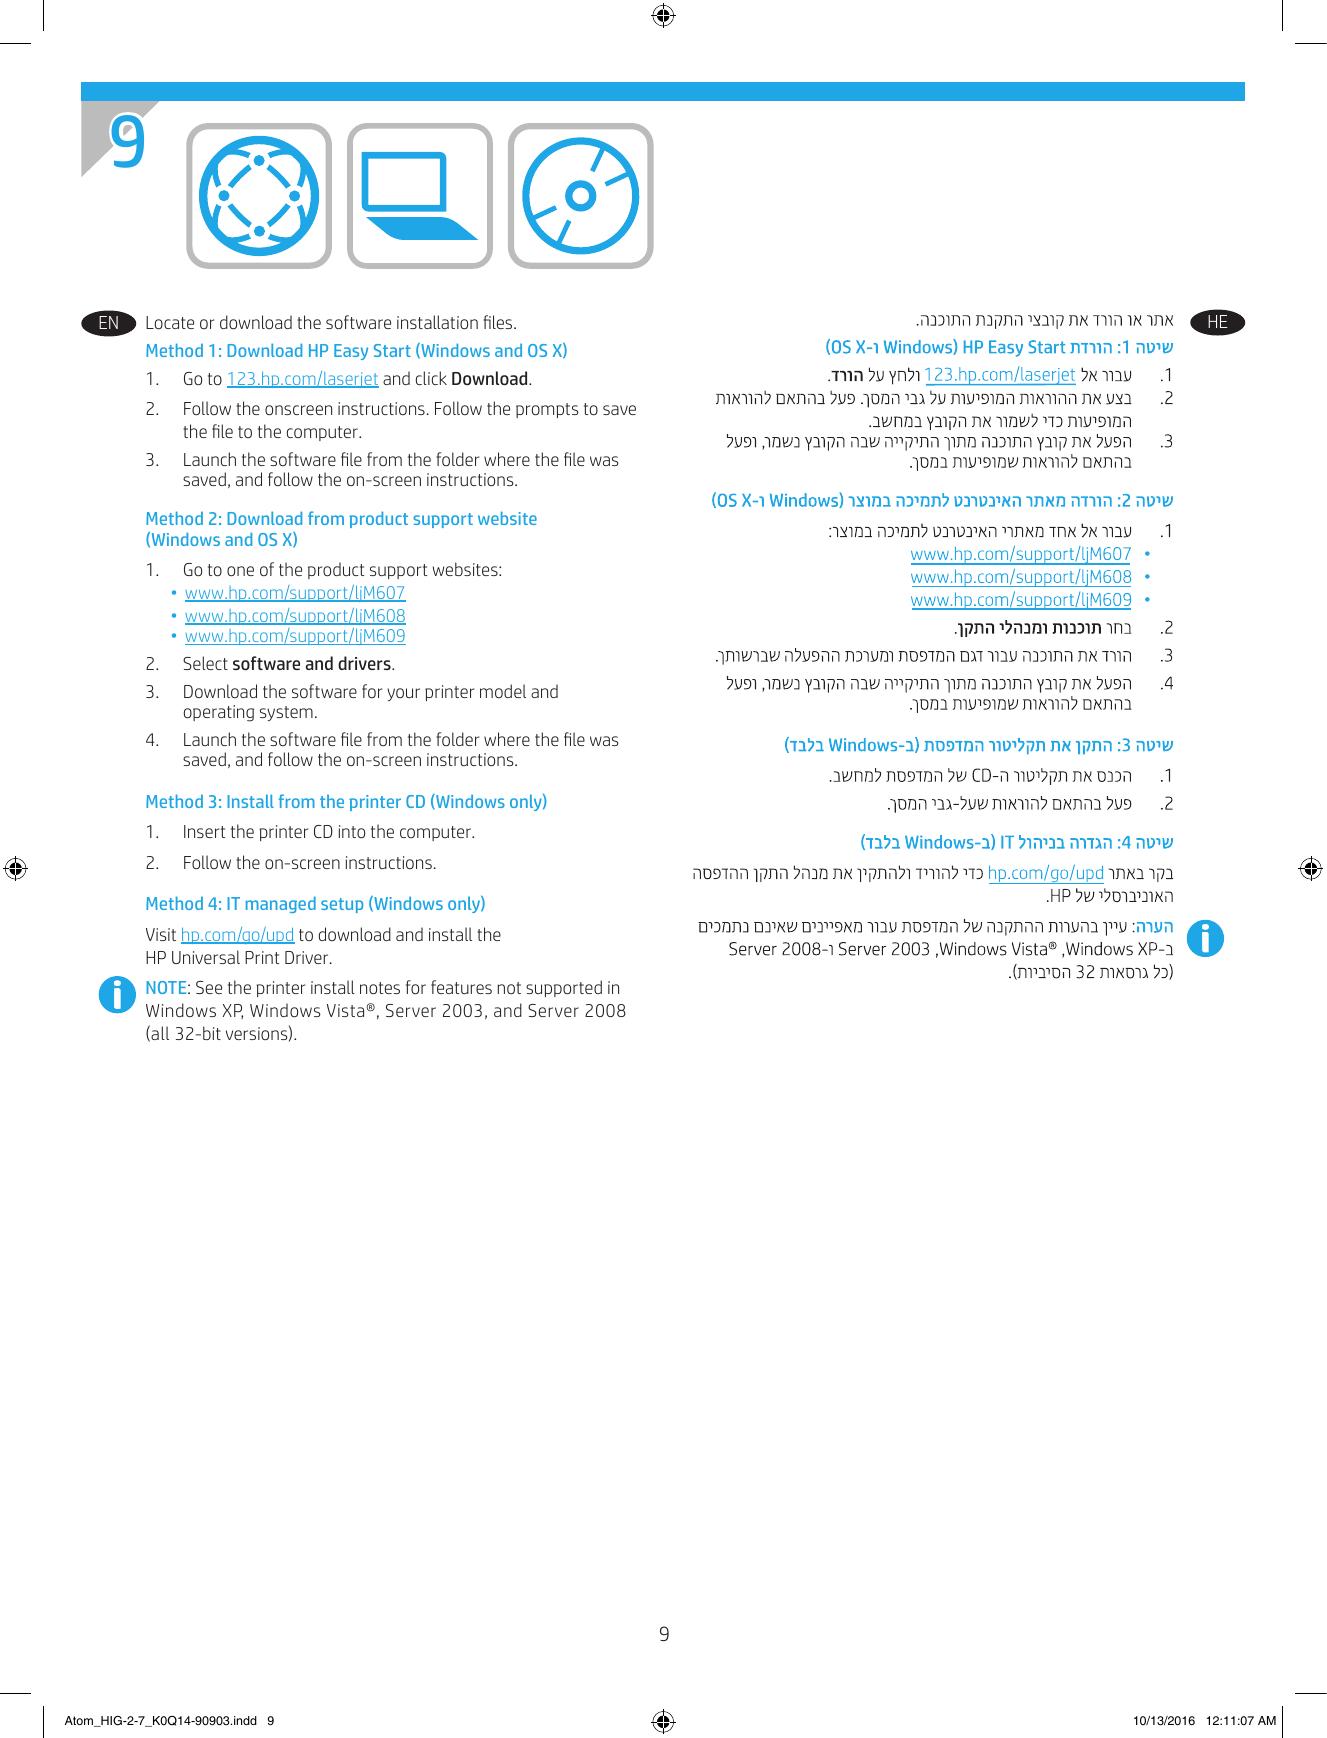 HP LaserJet Enterprise M607, M608, M609 Installation Guide